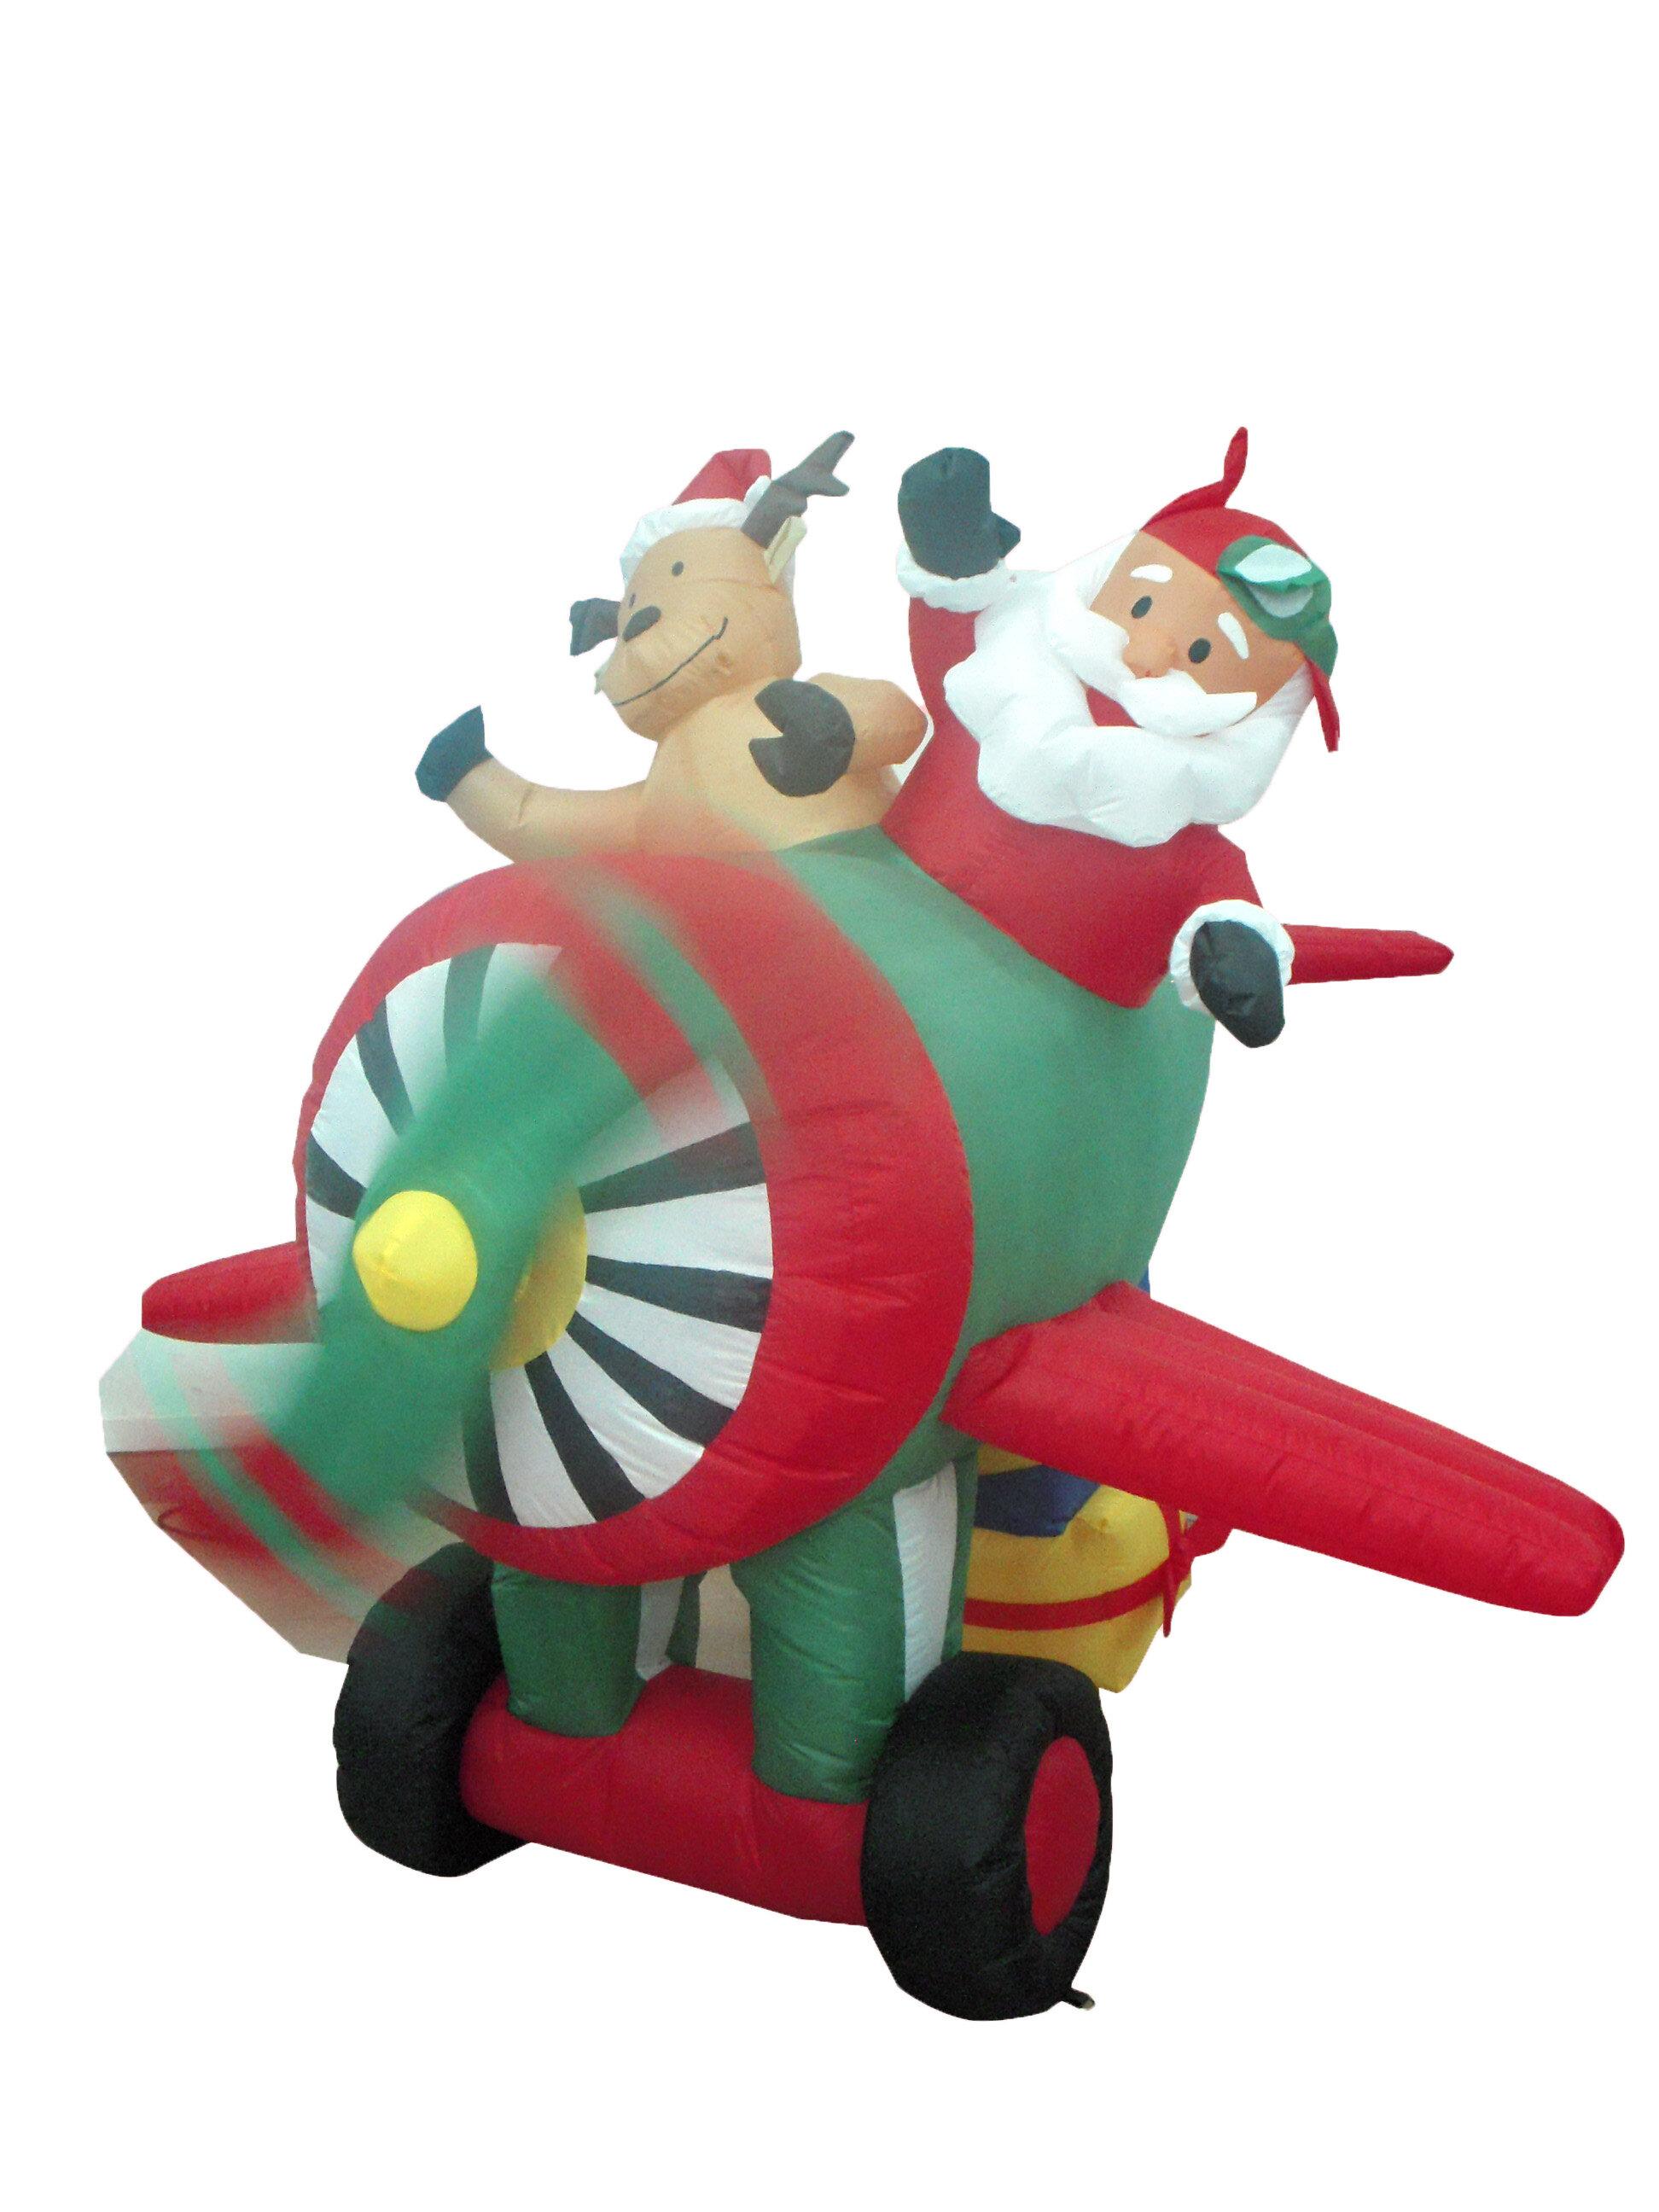 Christmas Inflatable.Christmas Inflatable Santa On Plane Decoration